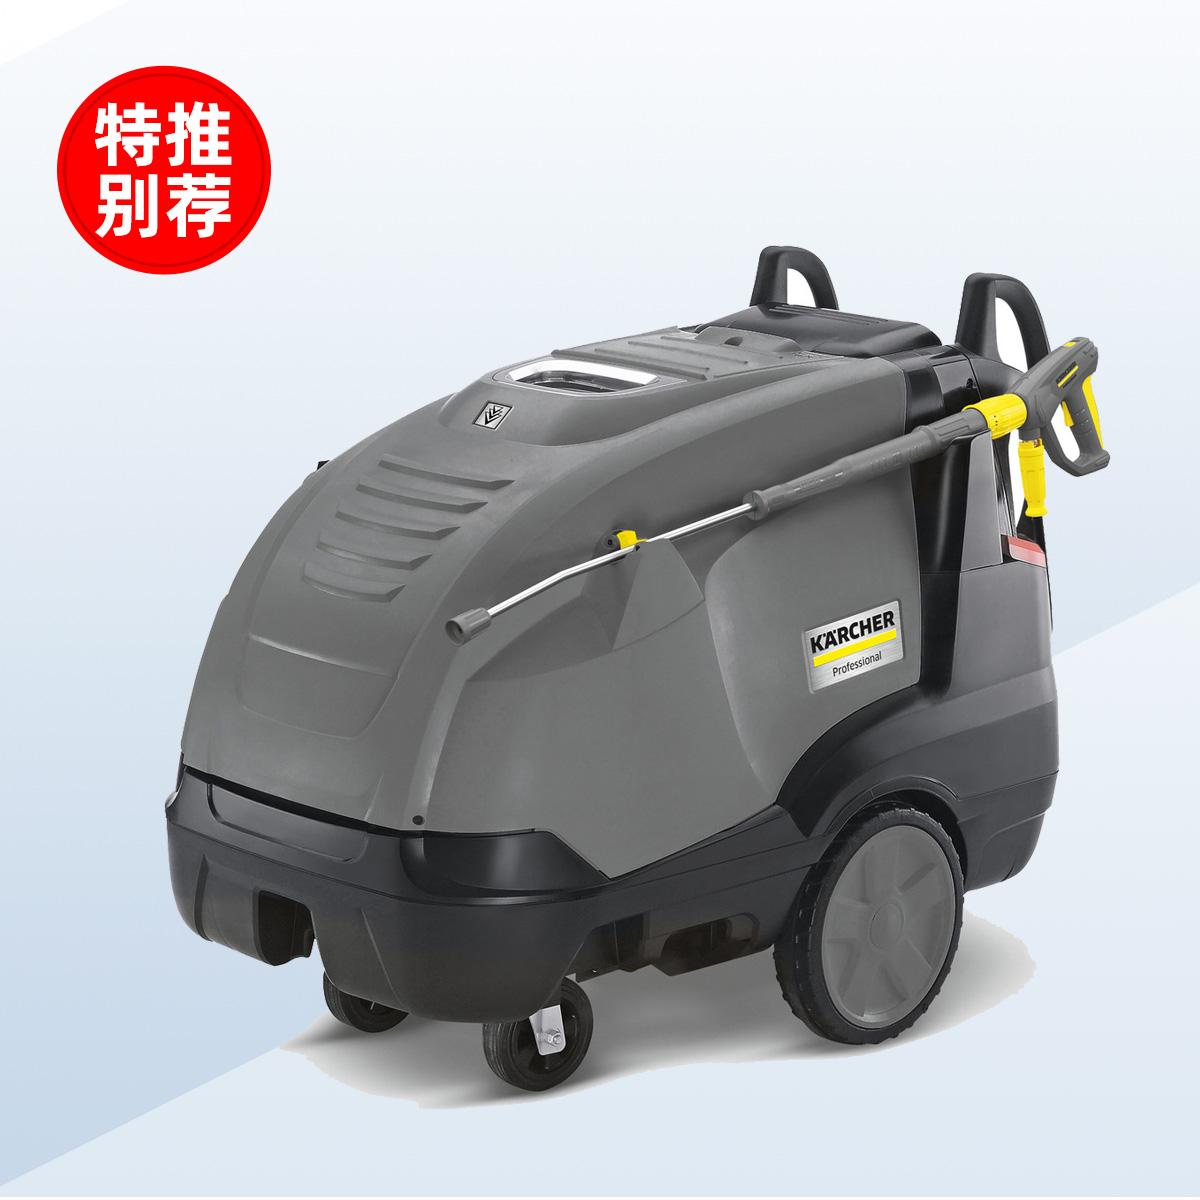 HDS 13/20-4S热水高压清洗机